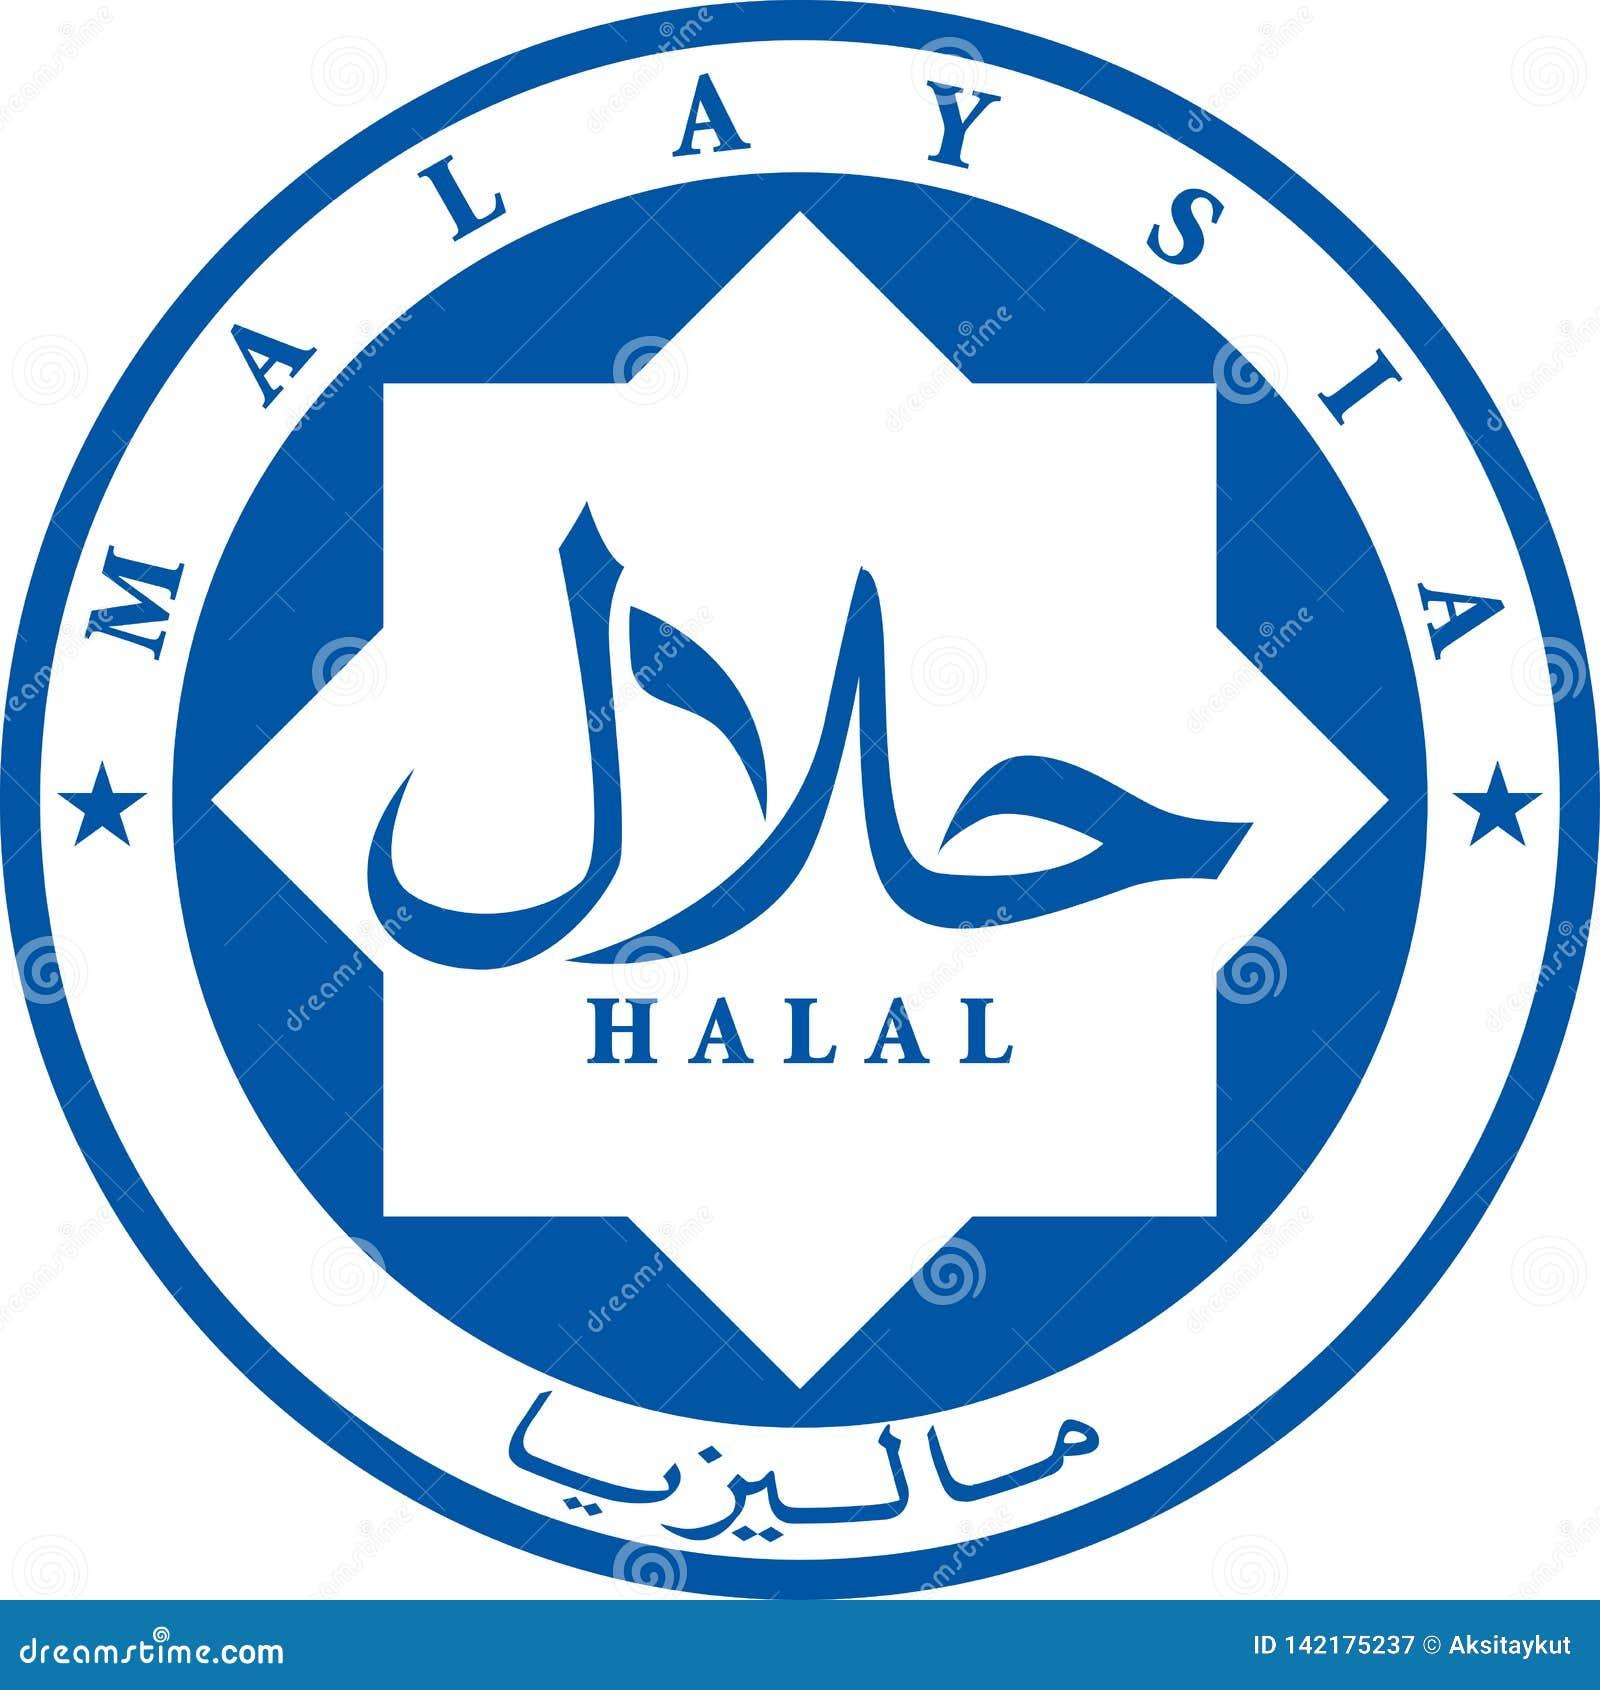 Malaysia Halal icon logo